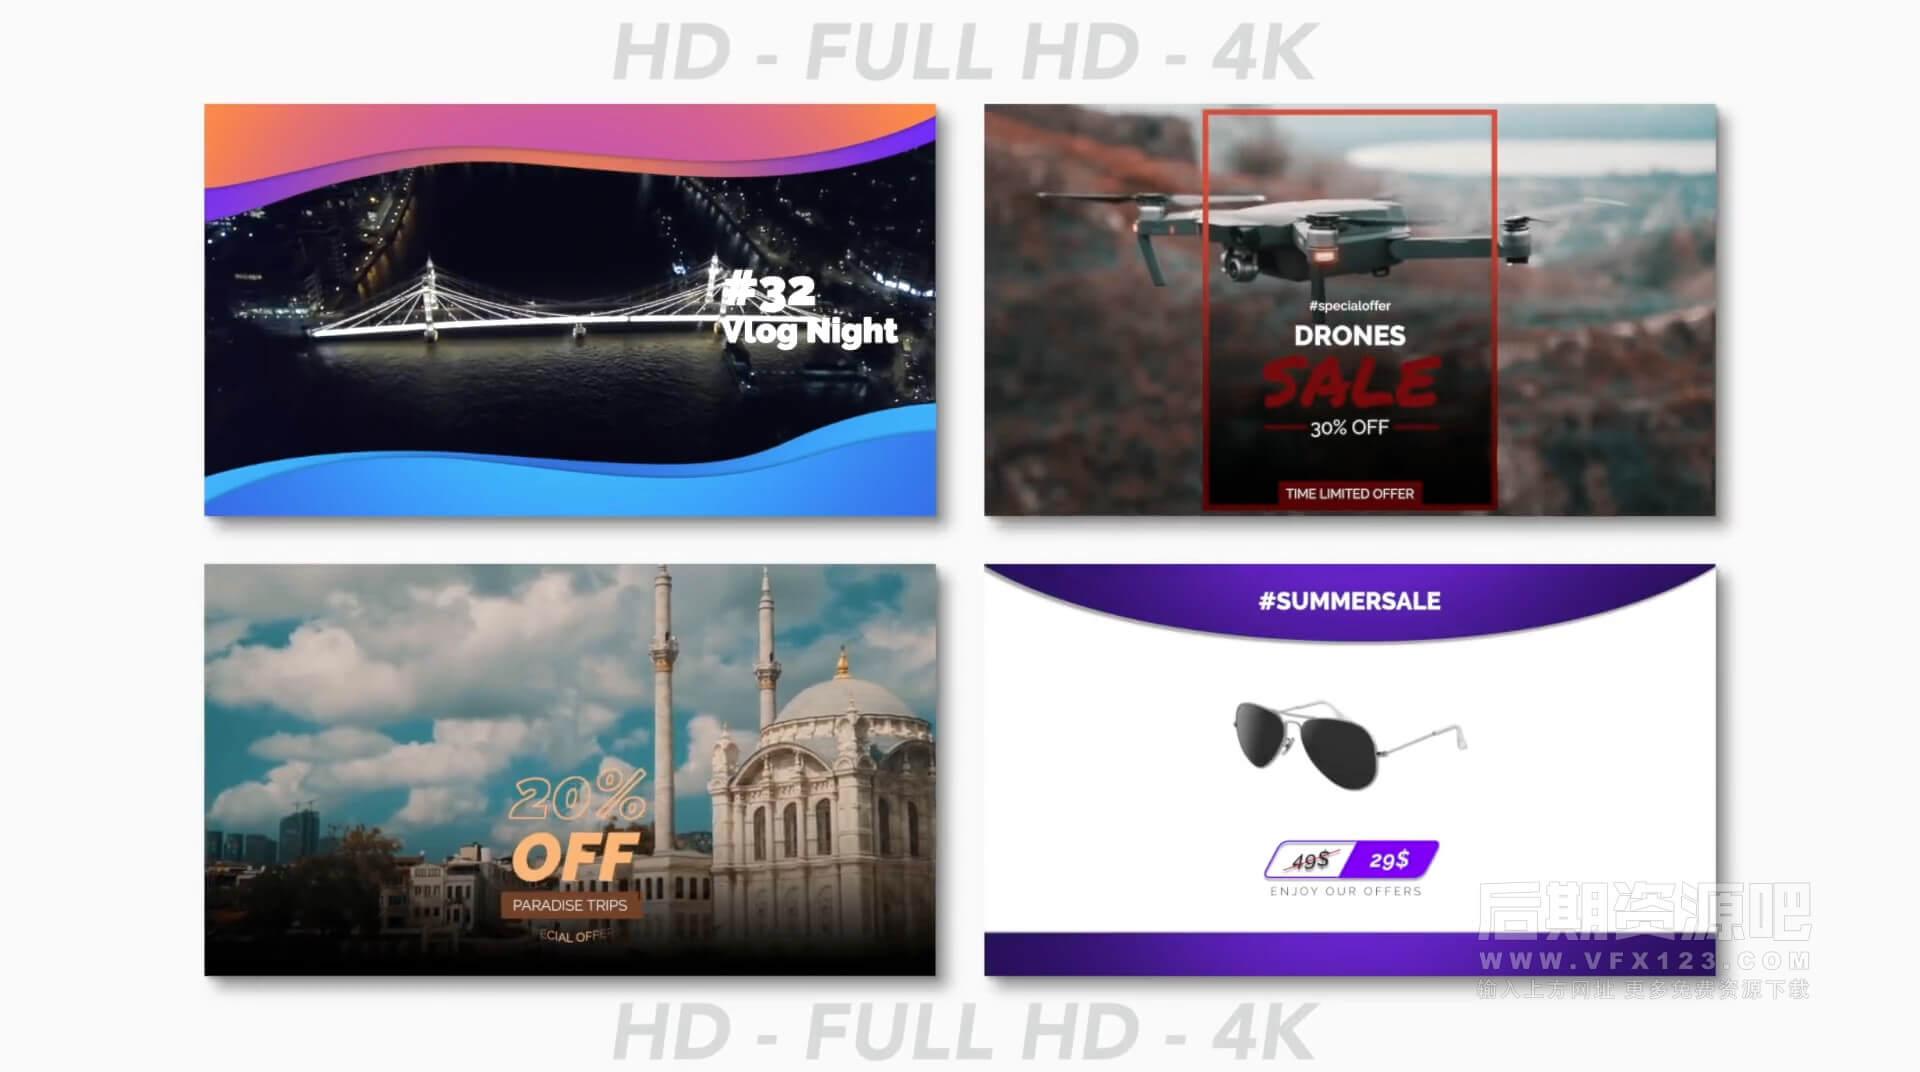 Fcpx插件 25个社交媒体图片视频展示模板 适用手机自媒体多分辨率